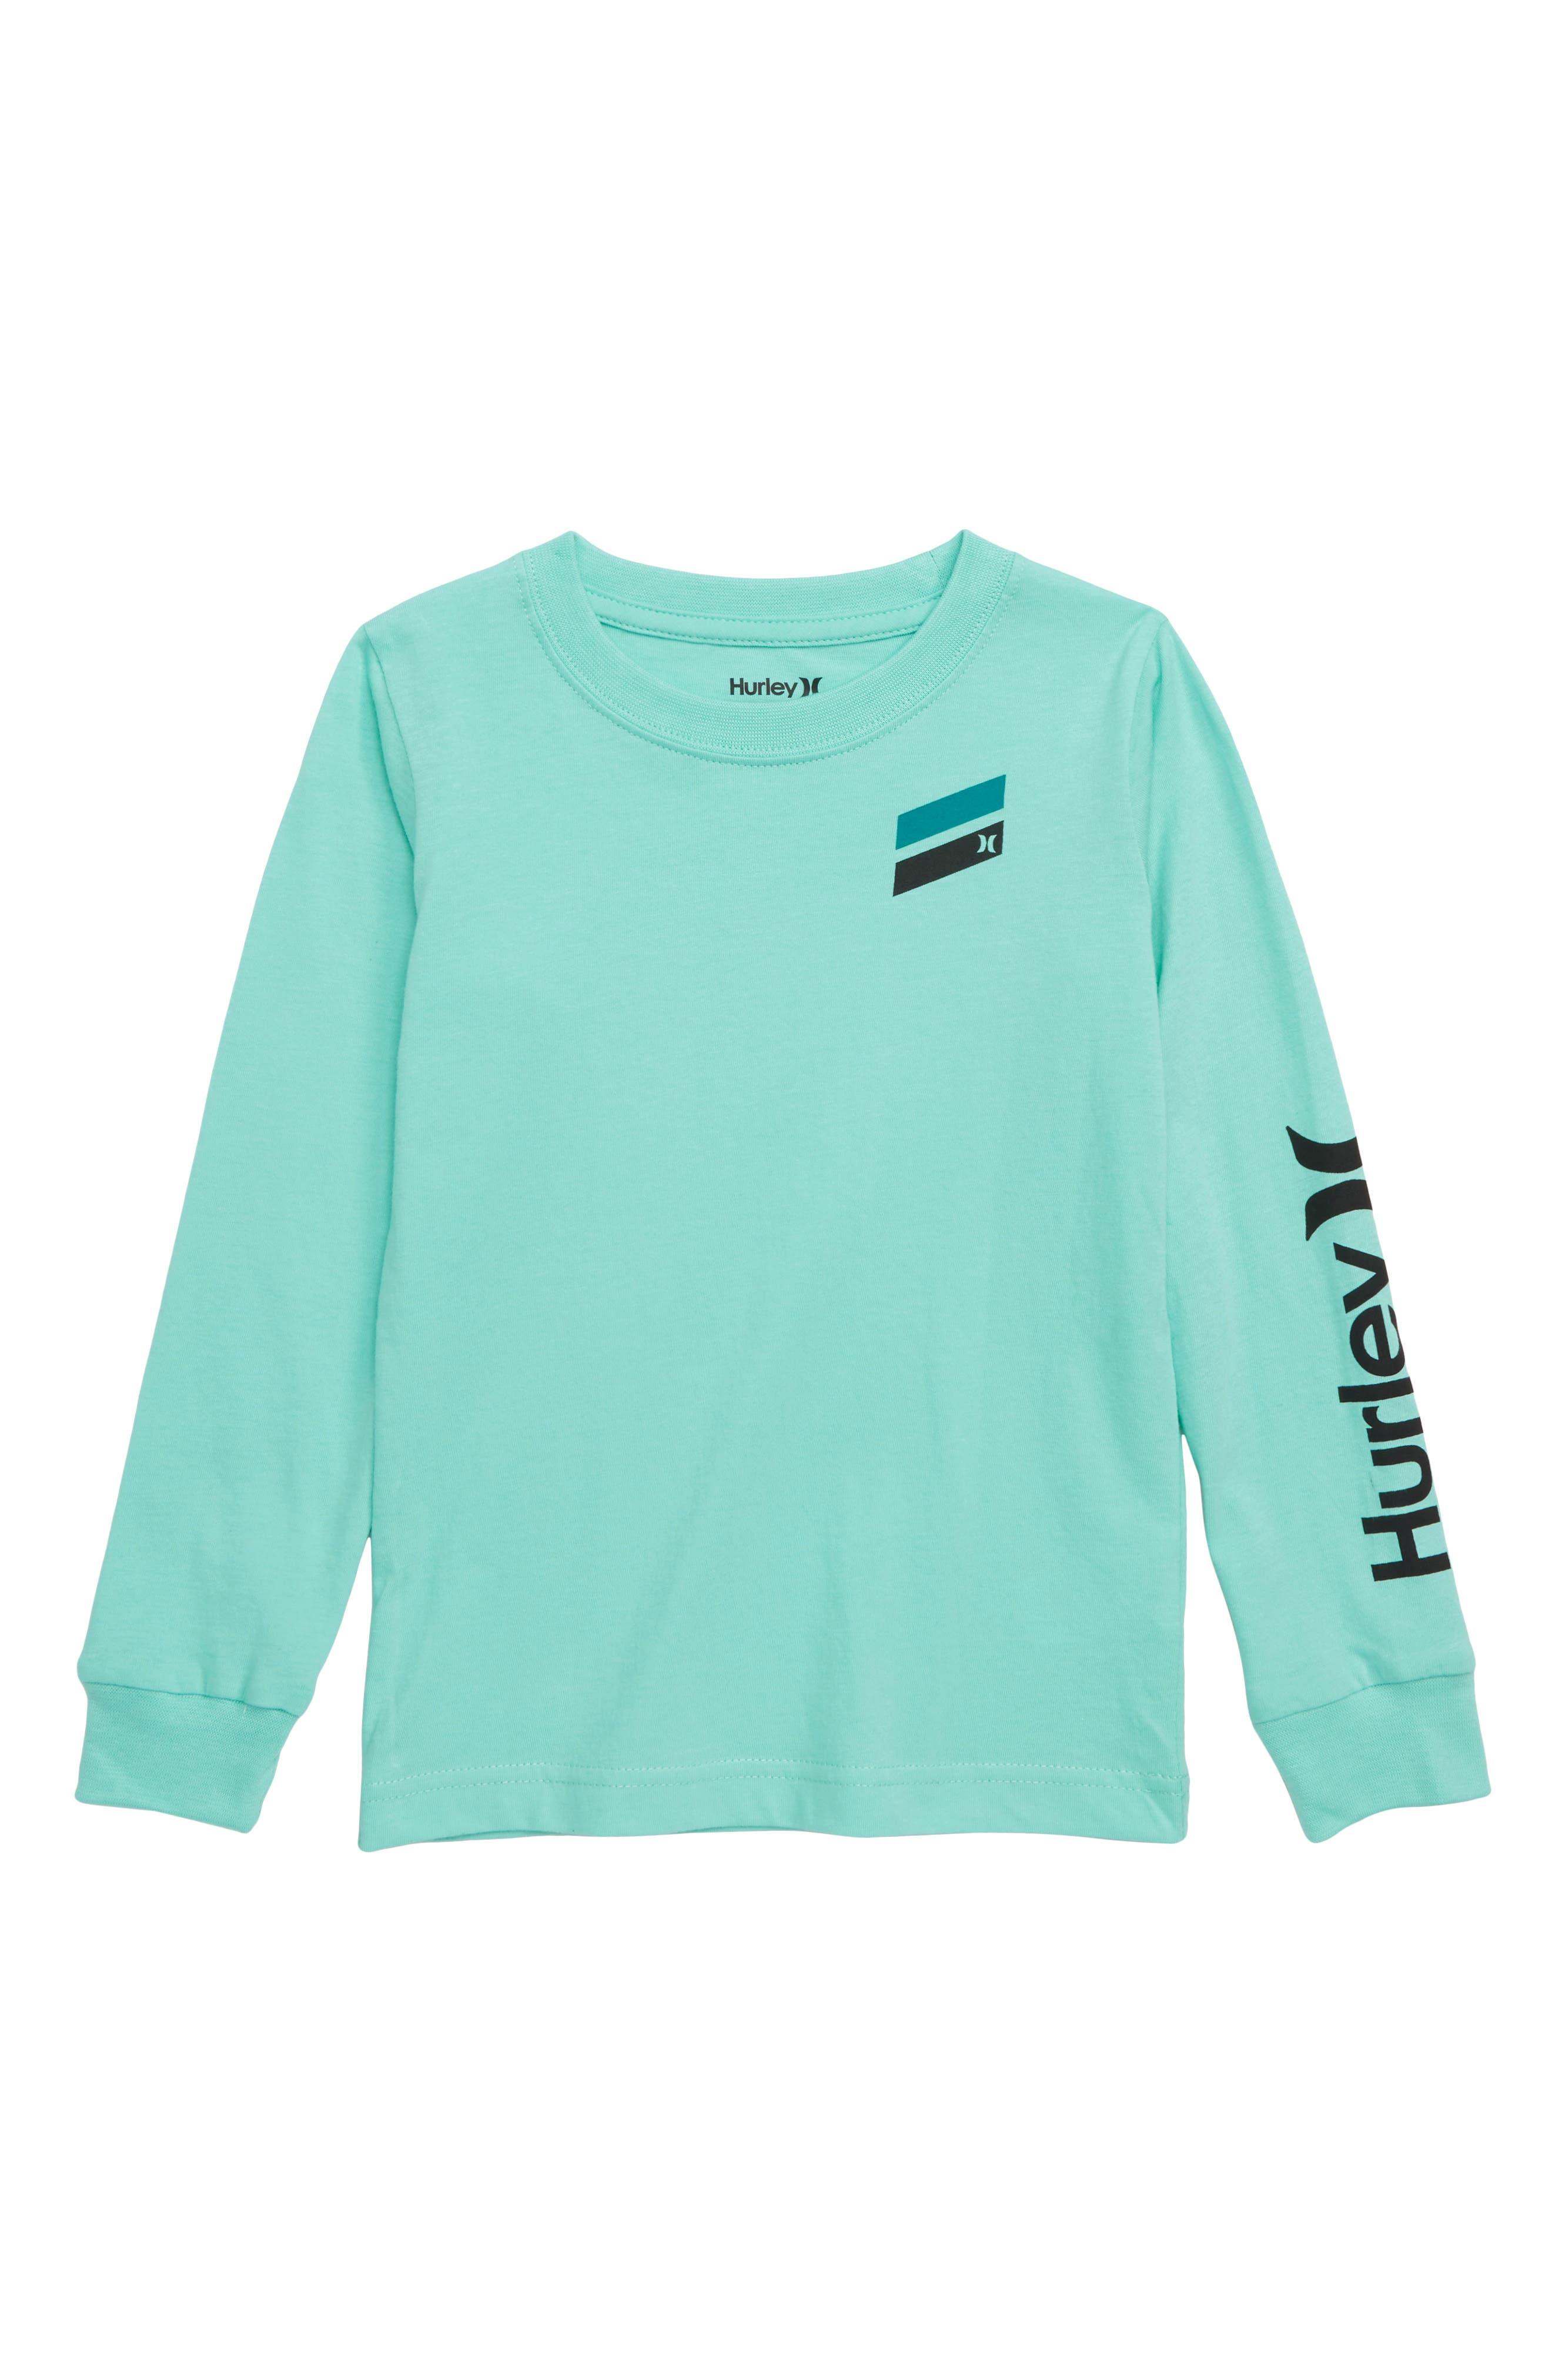 Boys Hurley Clothing Hoodies Shirts Pants T Nordstrom Shirt